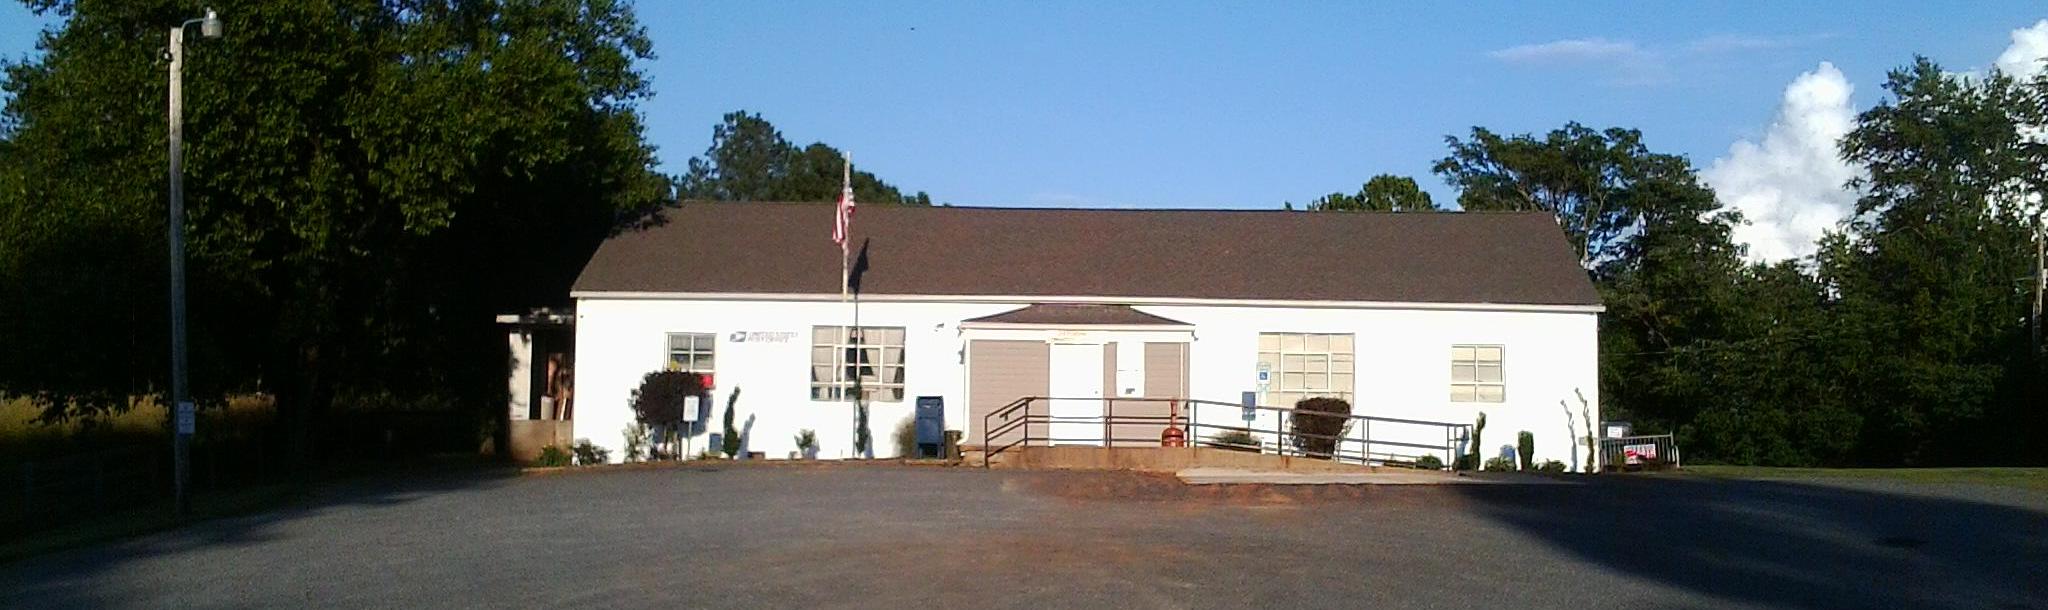 Jefferson VA Ruritan Clubhouse (photo credit Linda Bradshaw)